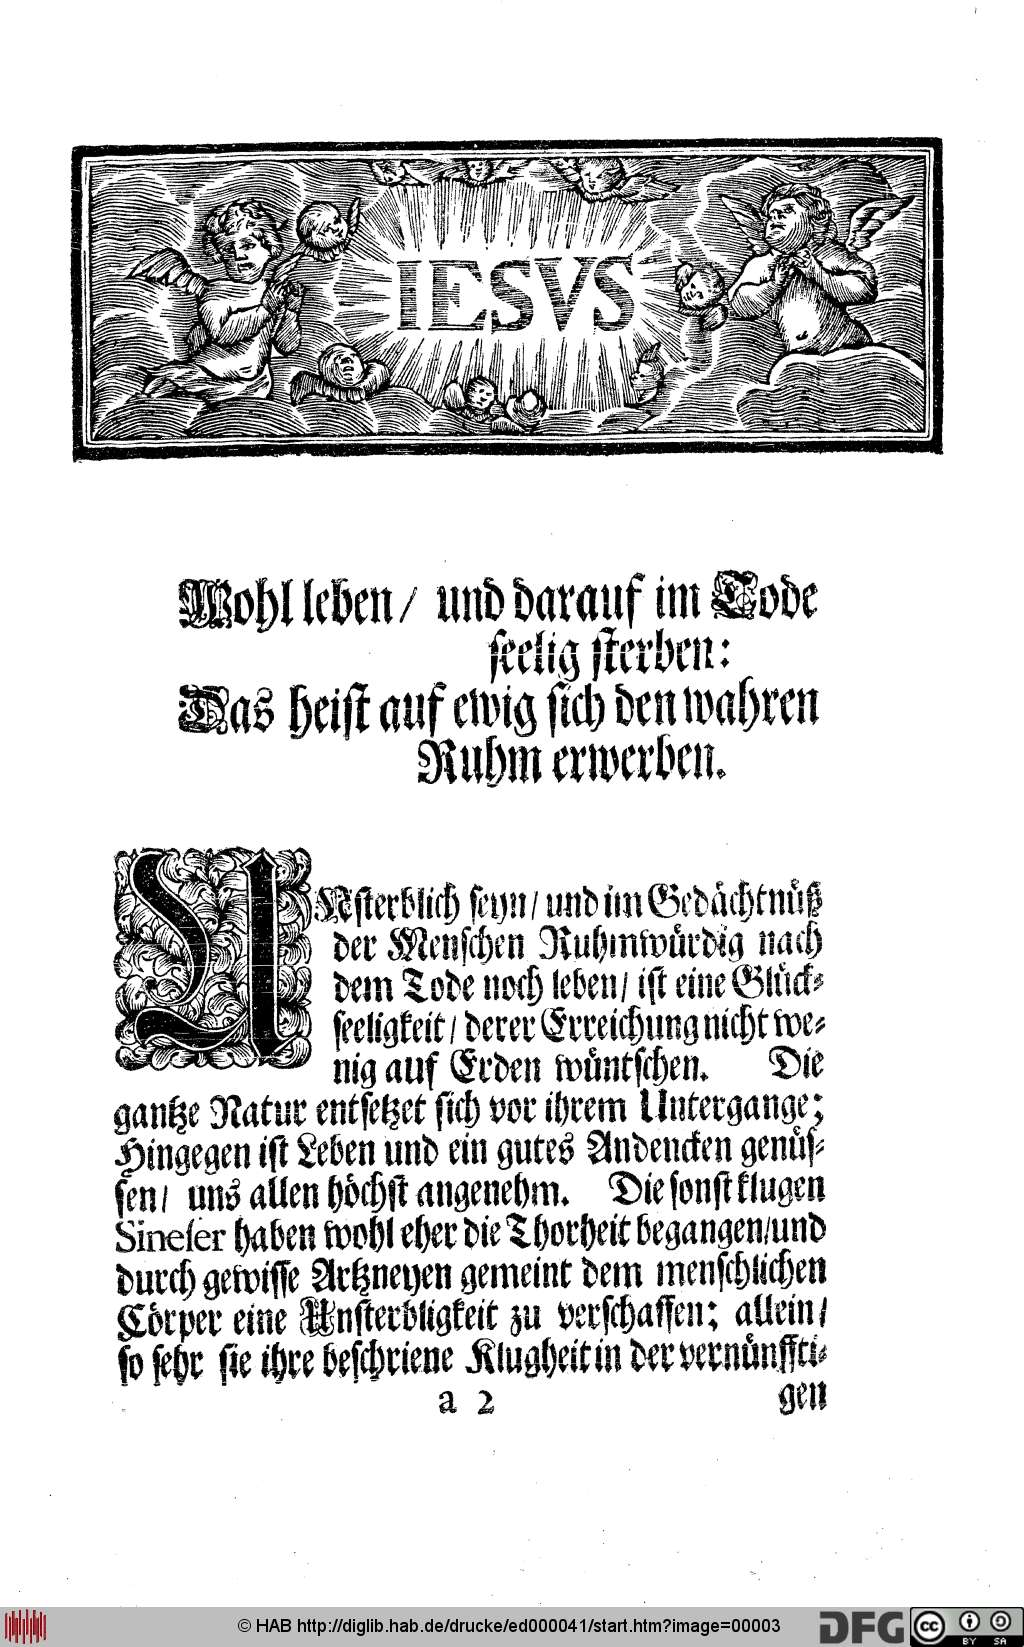 http://diglib.hab.de/drucke/ed000041/00003.jpg